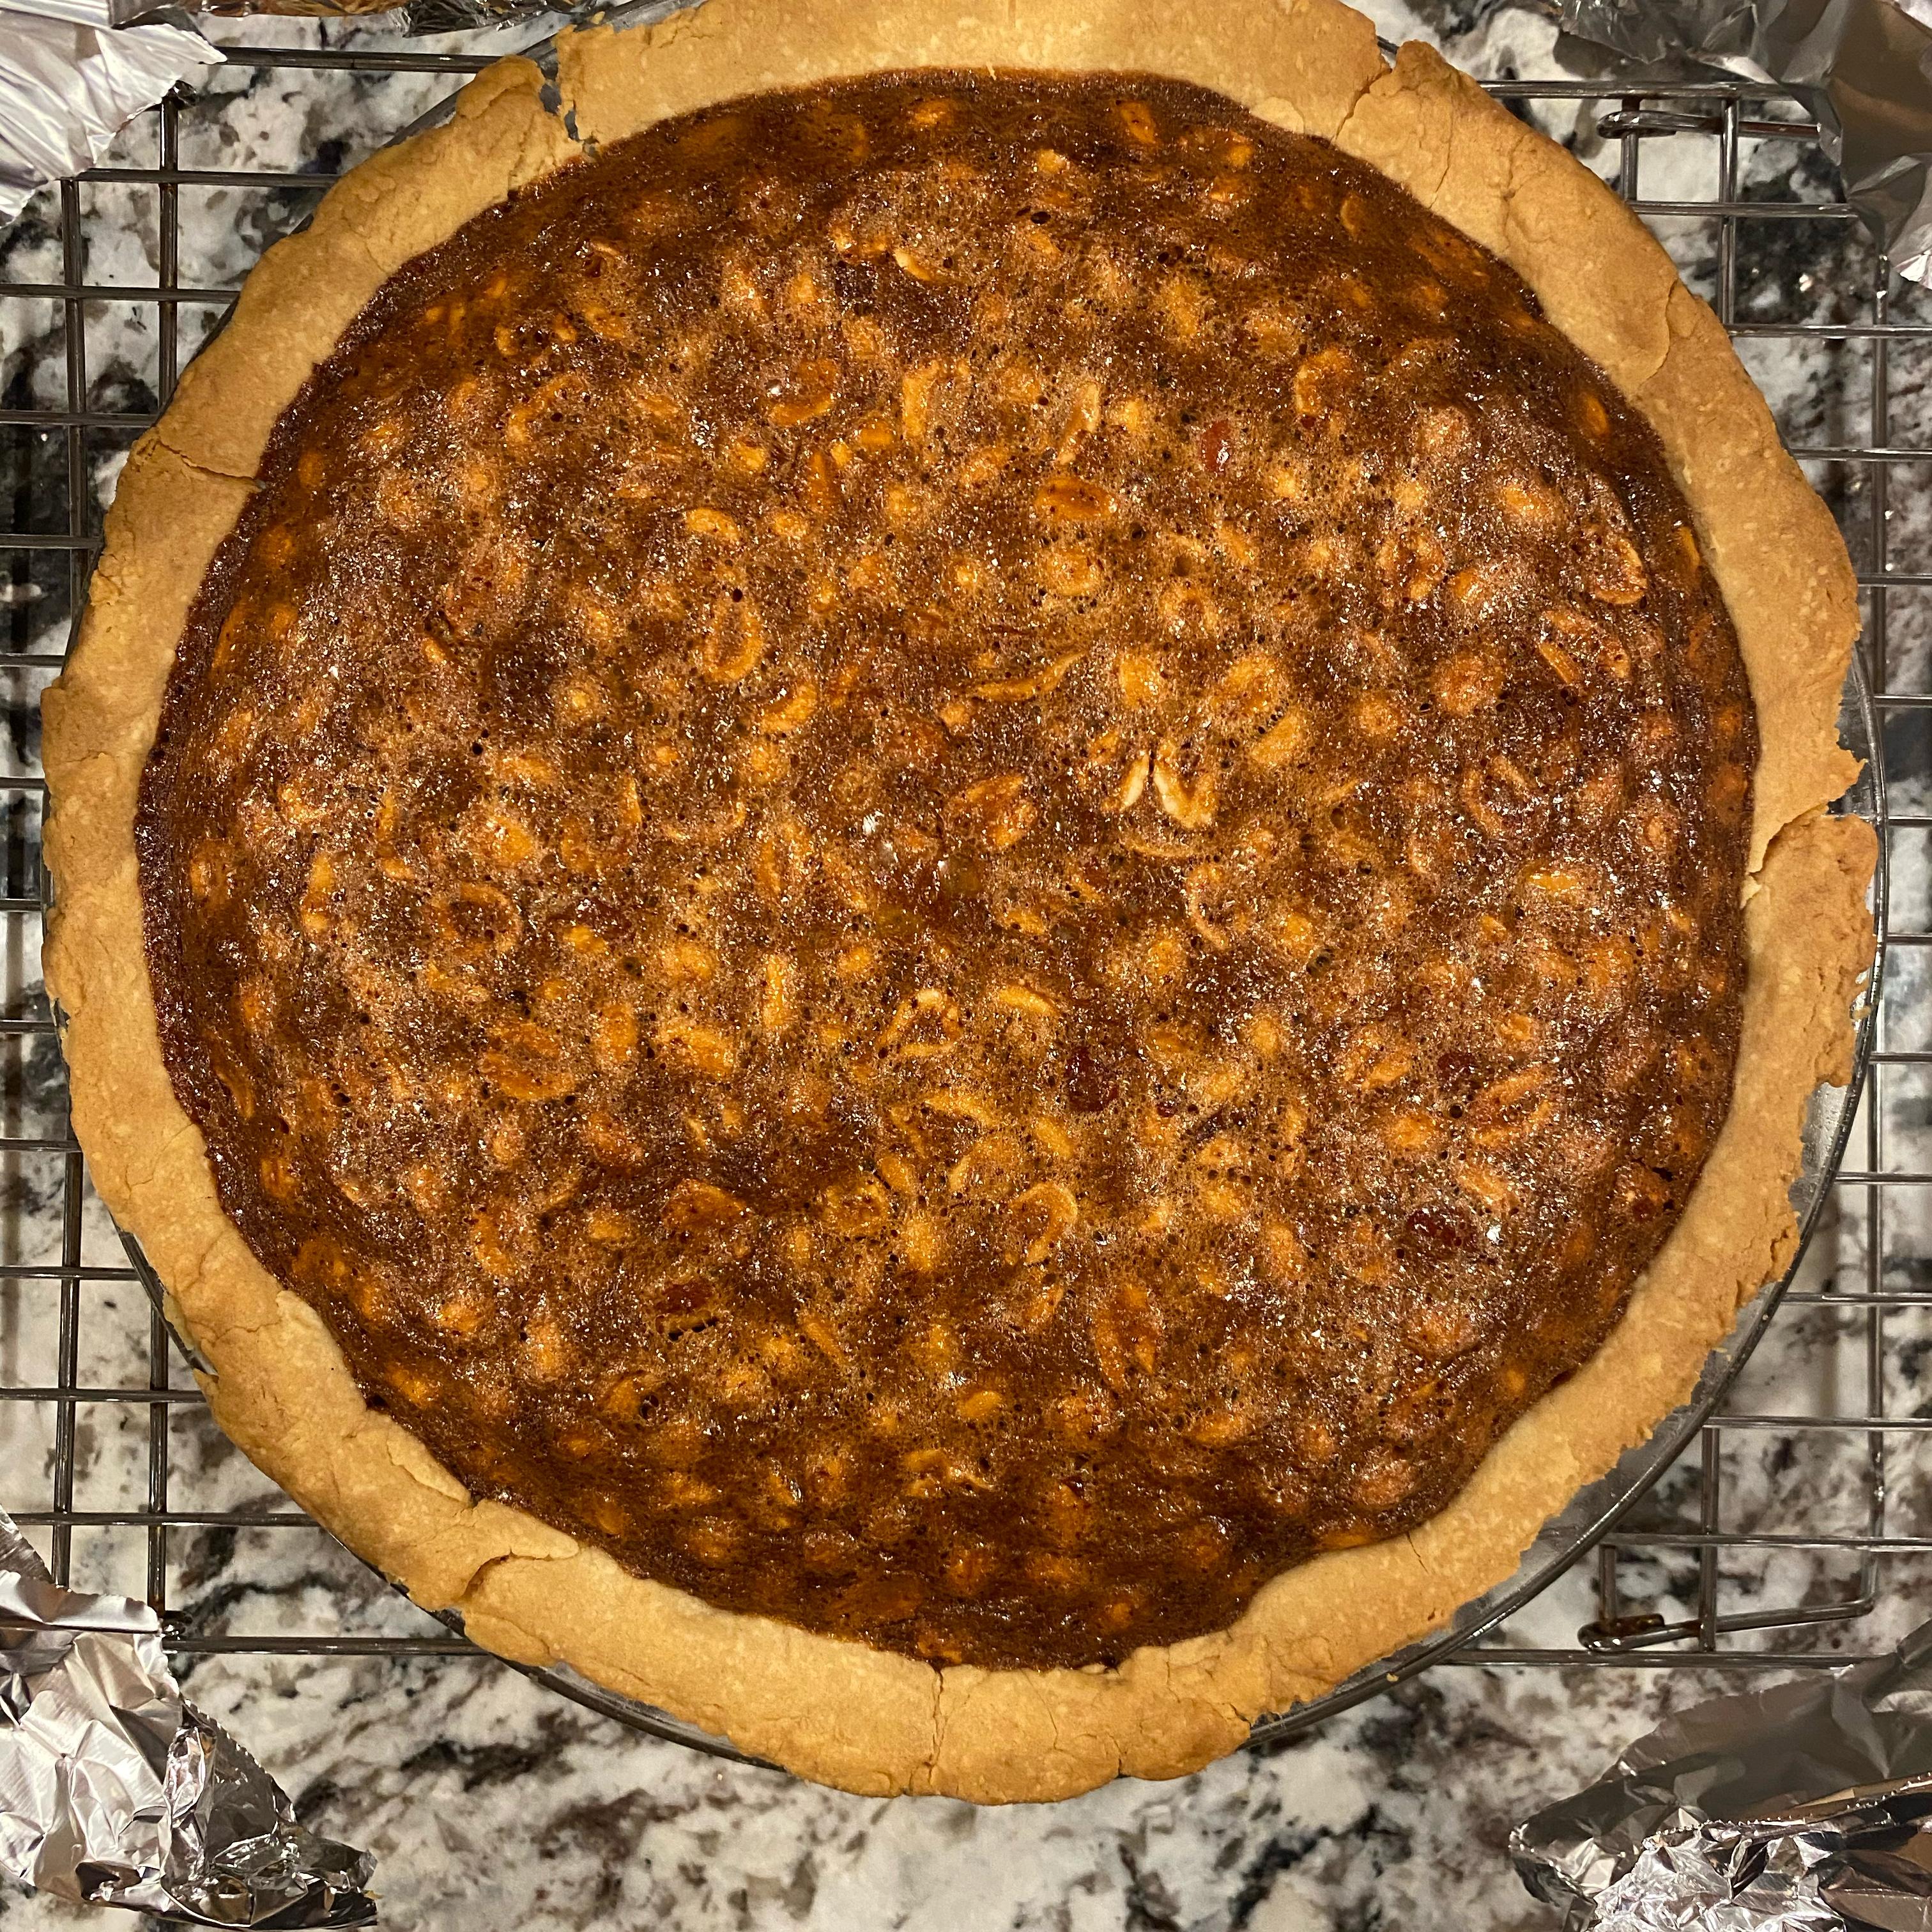 Southern Peanut Butter Pie Jessi C.